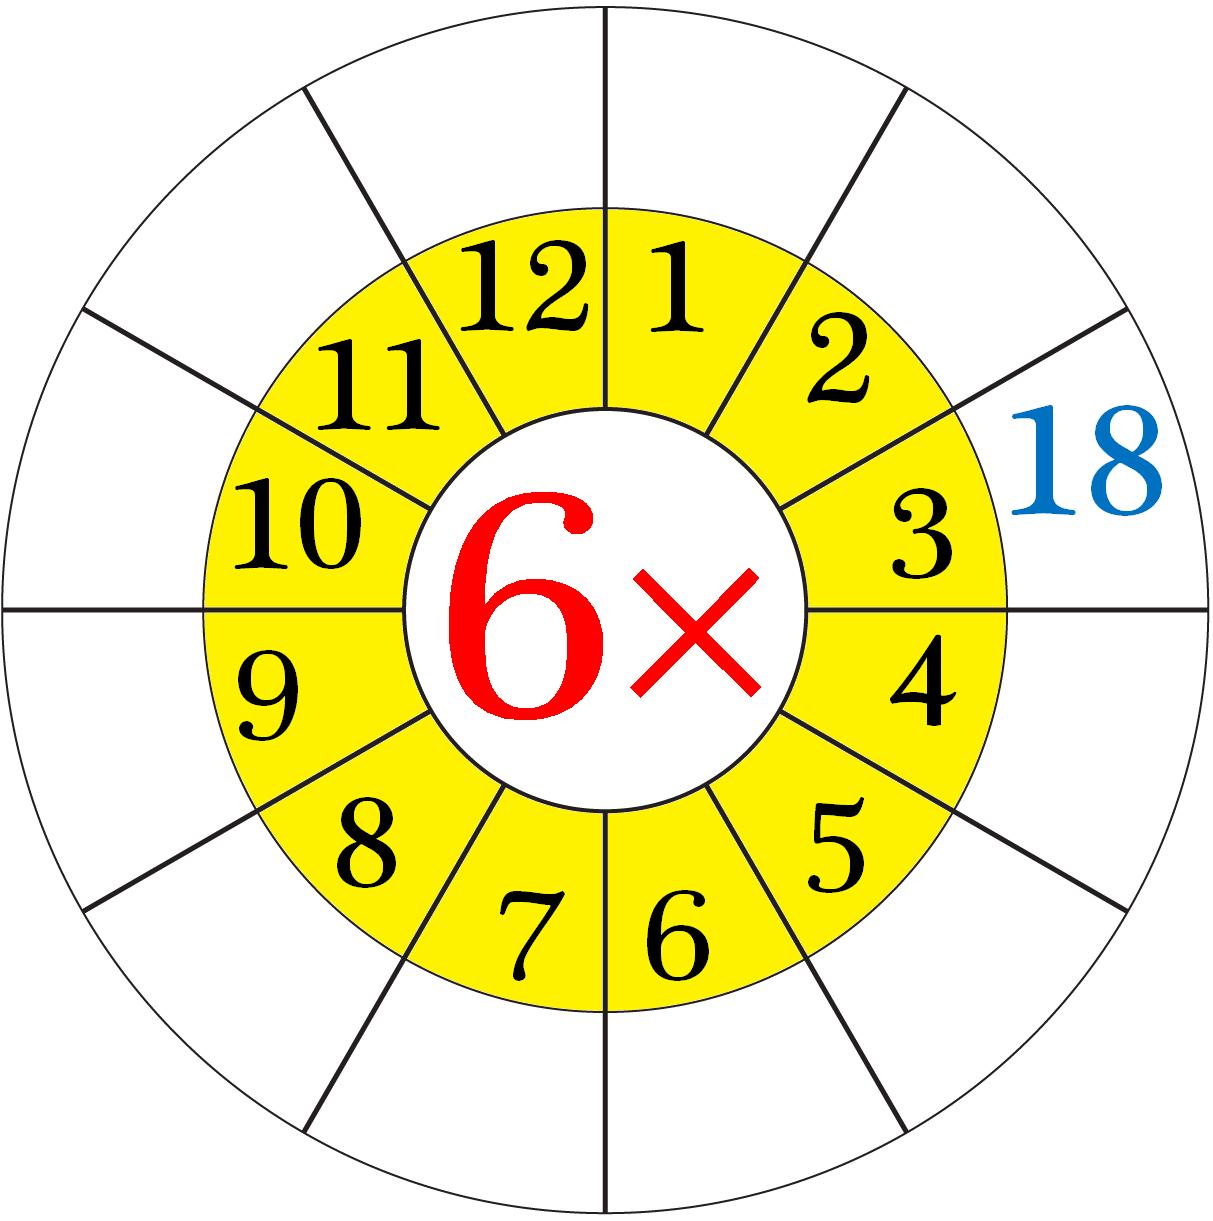 Worksheet On Multiplication Table Of 6